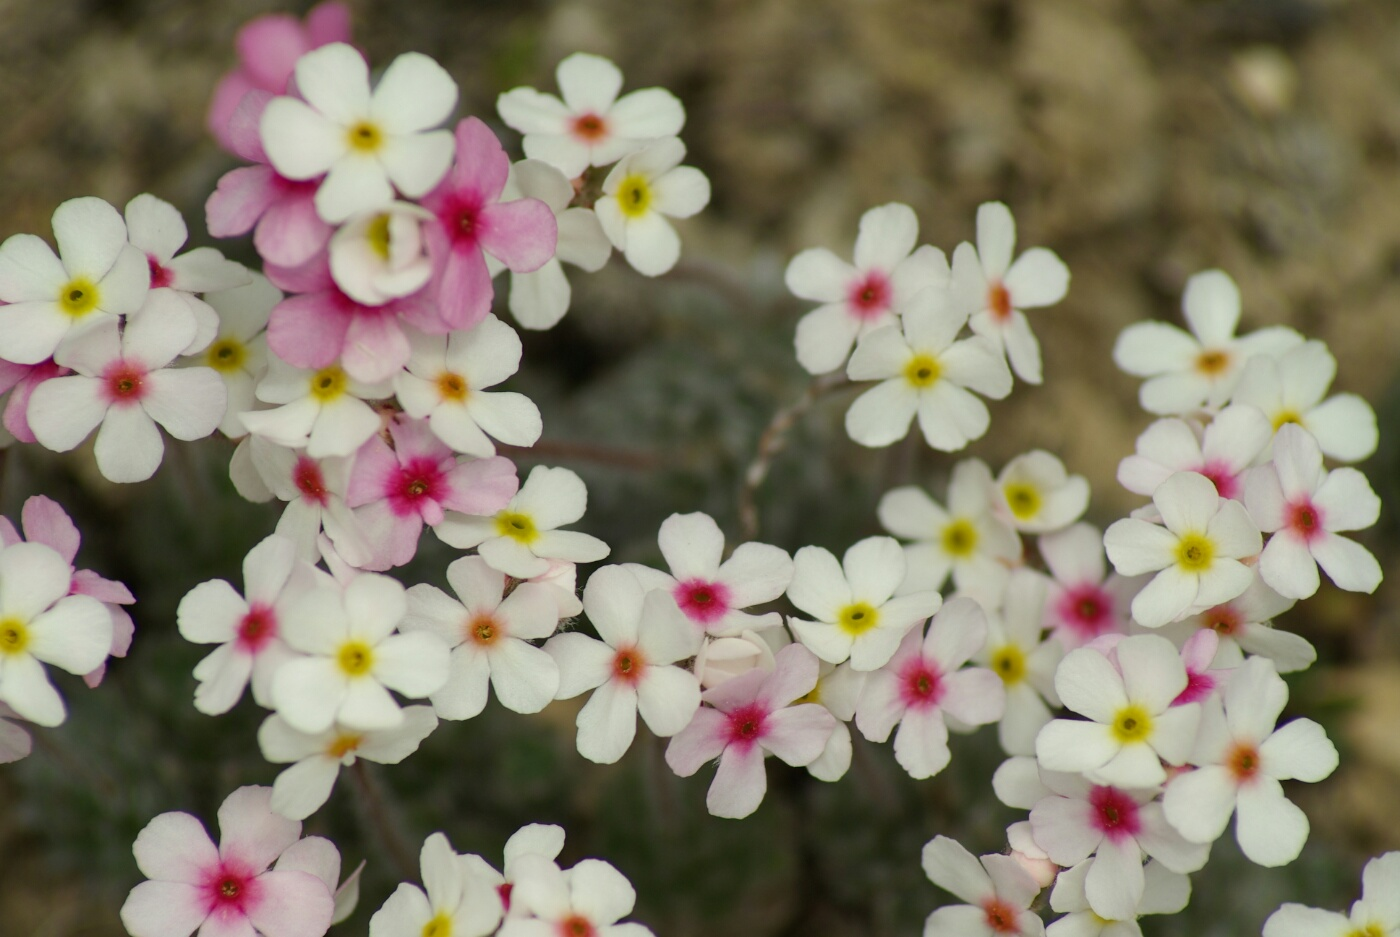 Phokar, Padmasambhava: Kleine Blumen am Wegrand